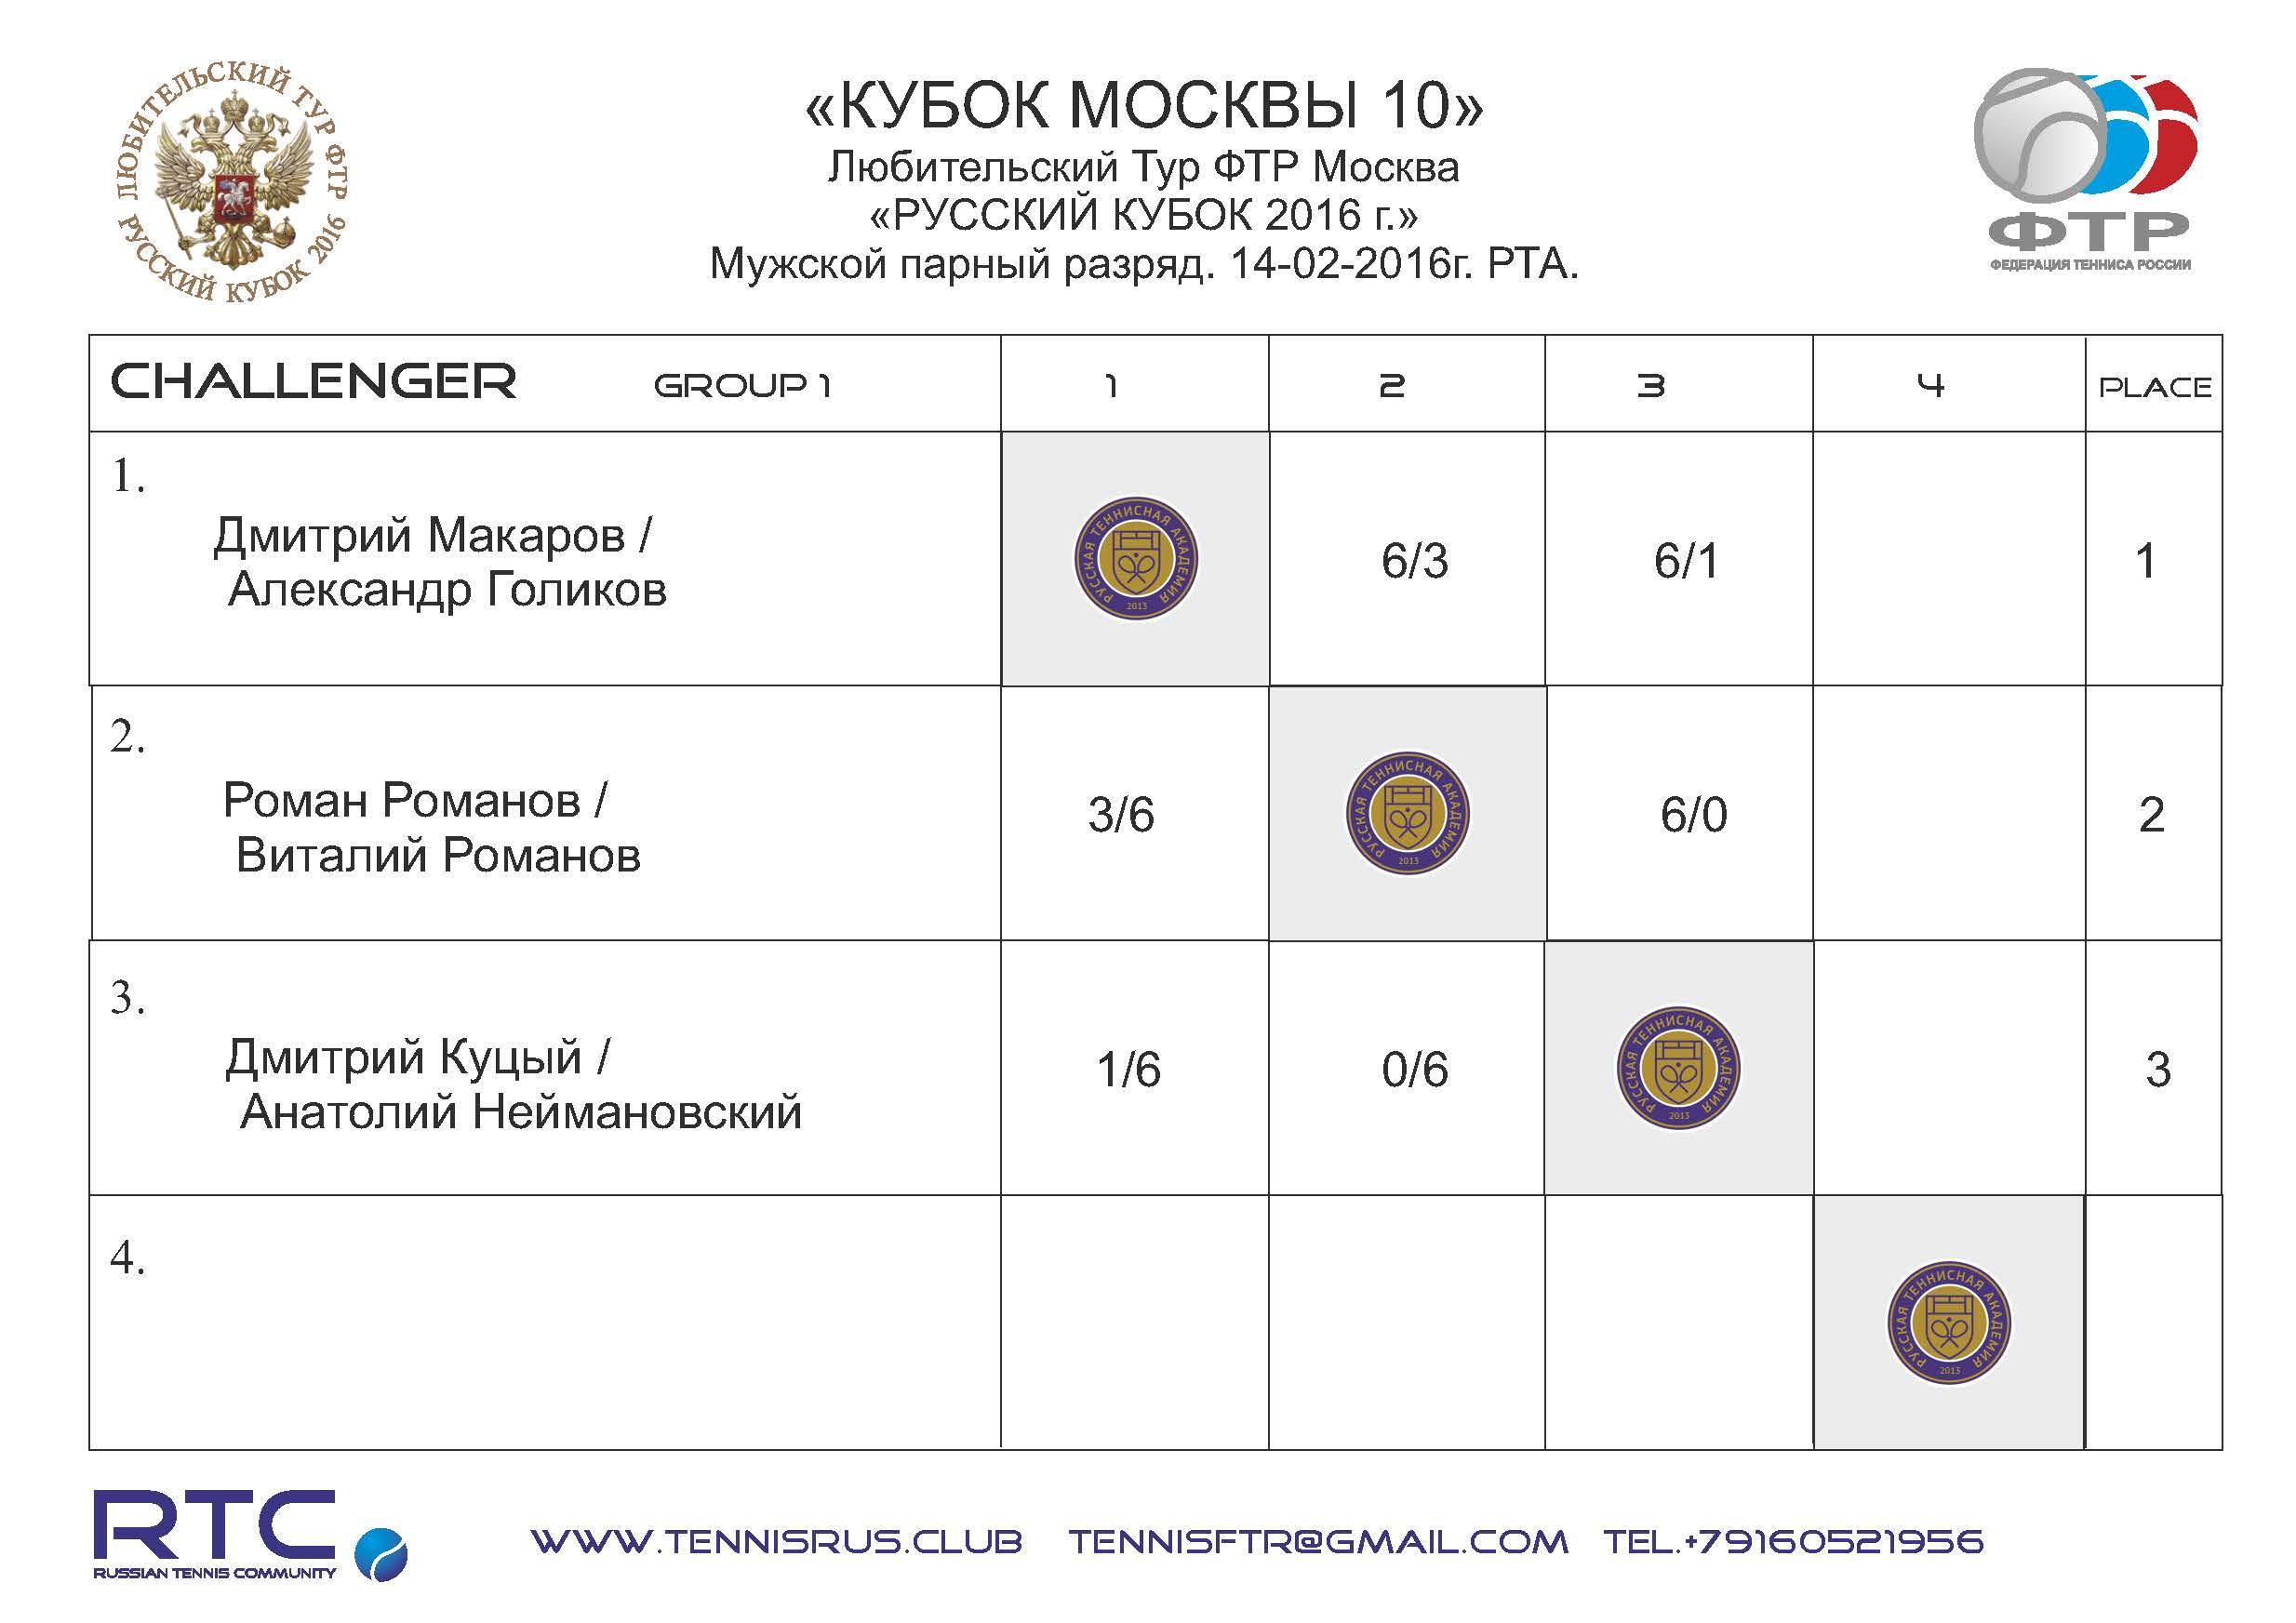 MC 10 2016 mens pairs Challenger GR 1